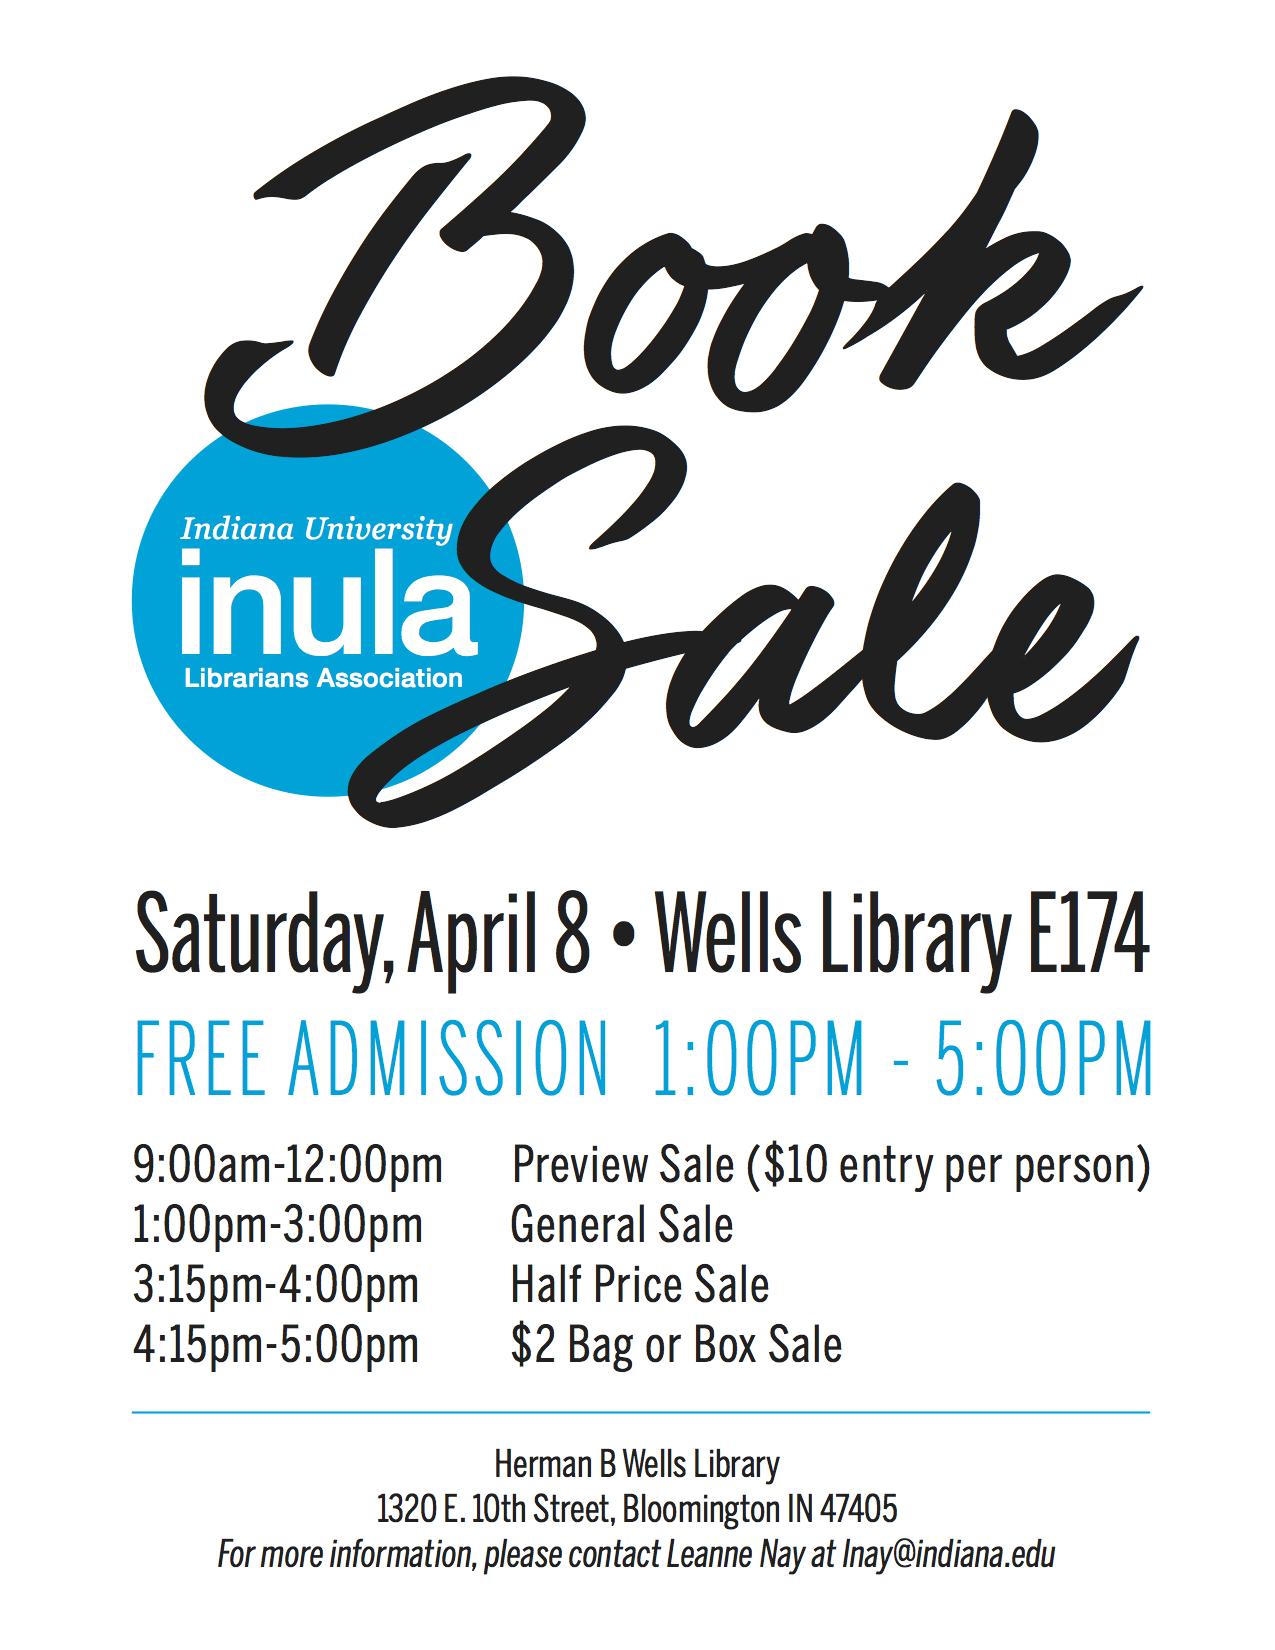 InULA Book Sale, April 8, Wells Library E174